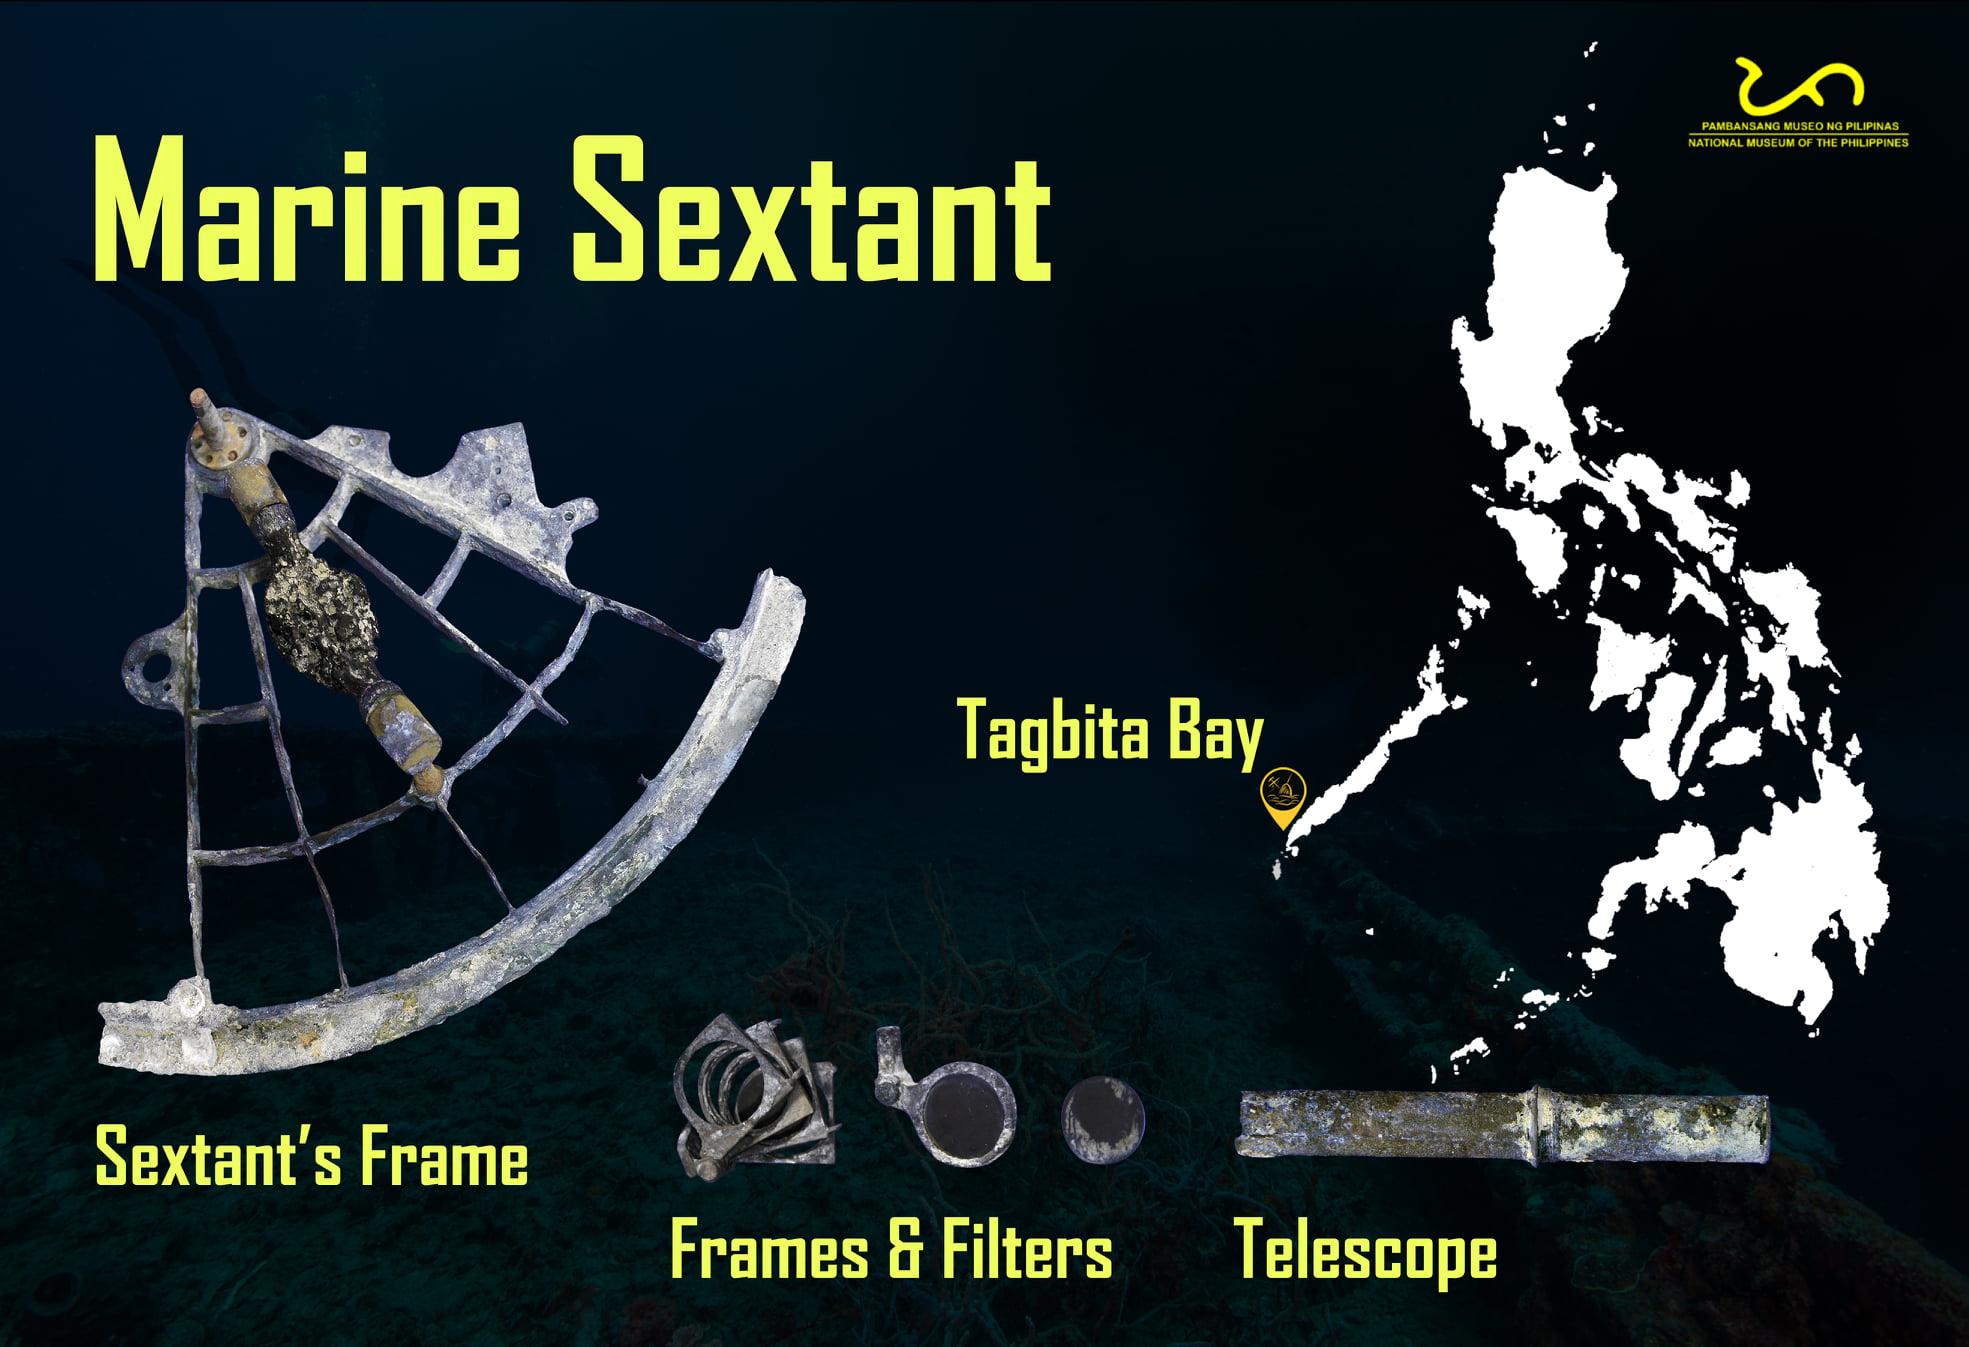 Vintage Sextant Found in Tagbita Shipwreck